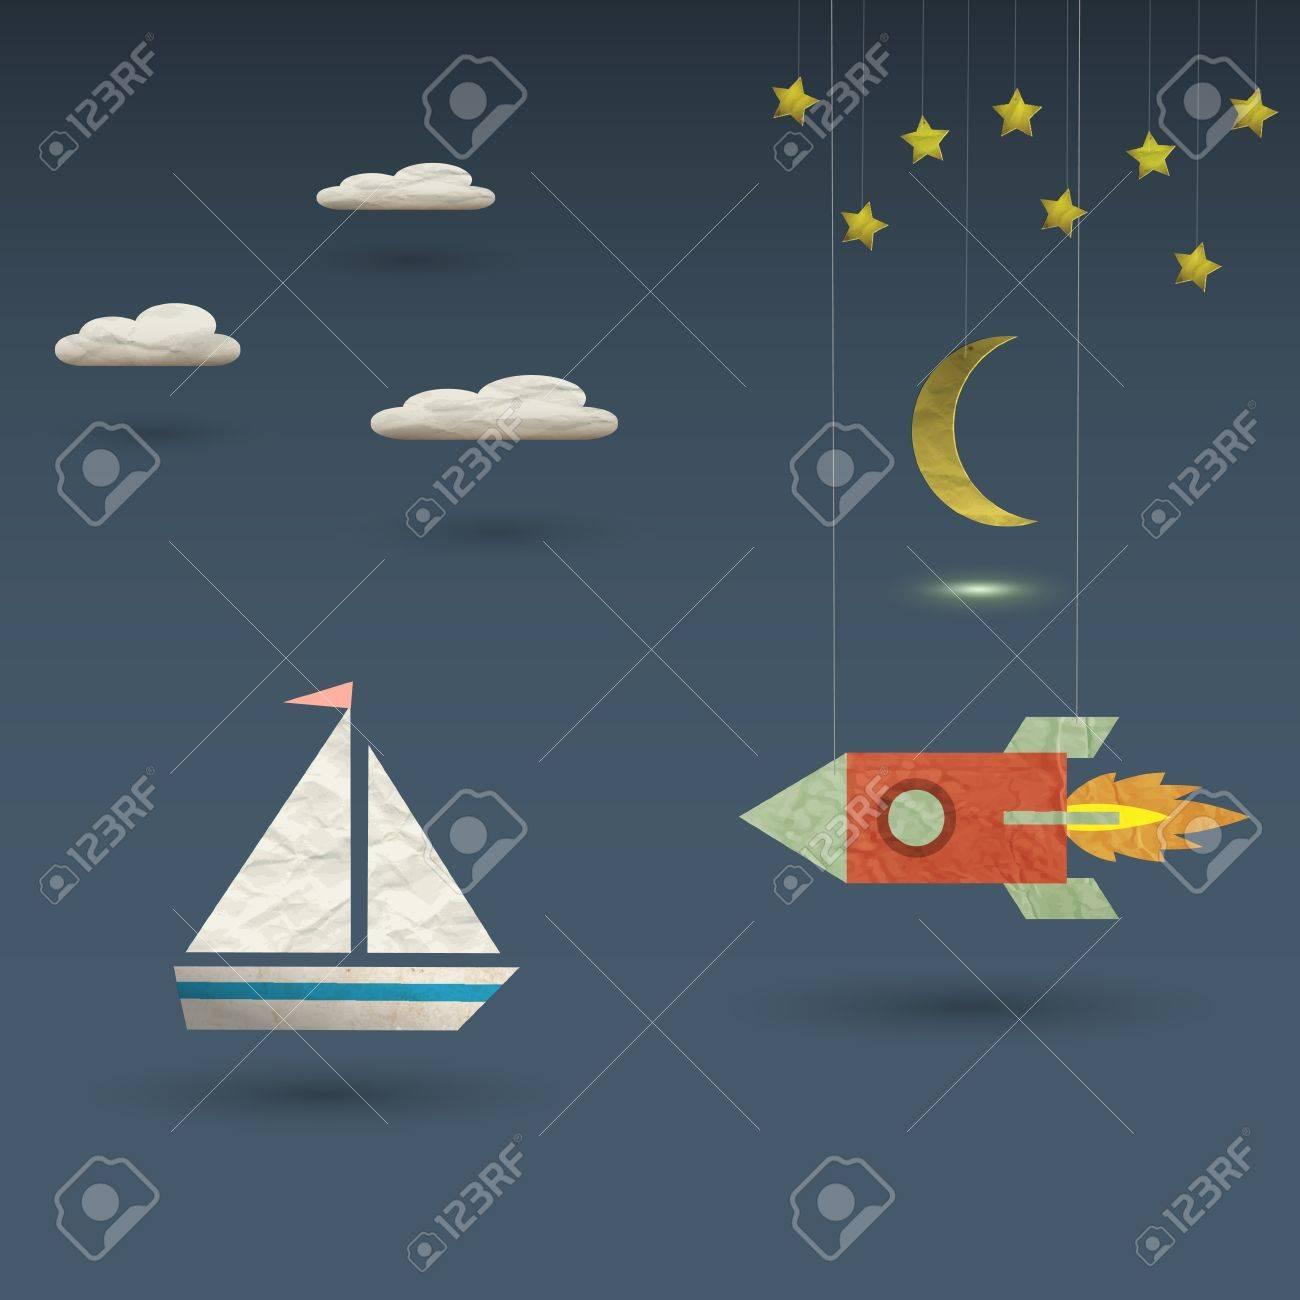 Retro rocket and sailboat Stock Vector - 15545321